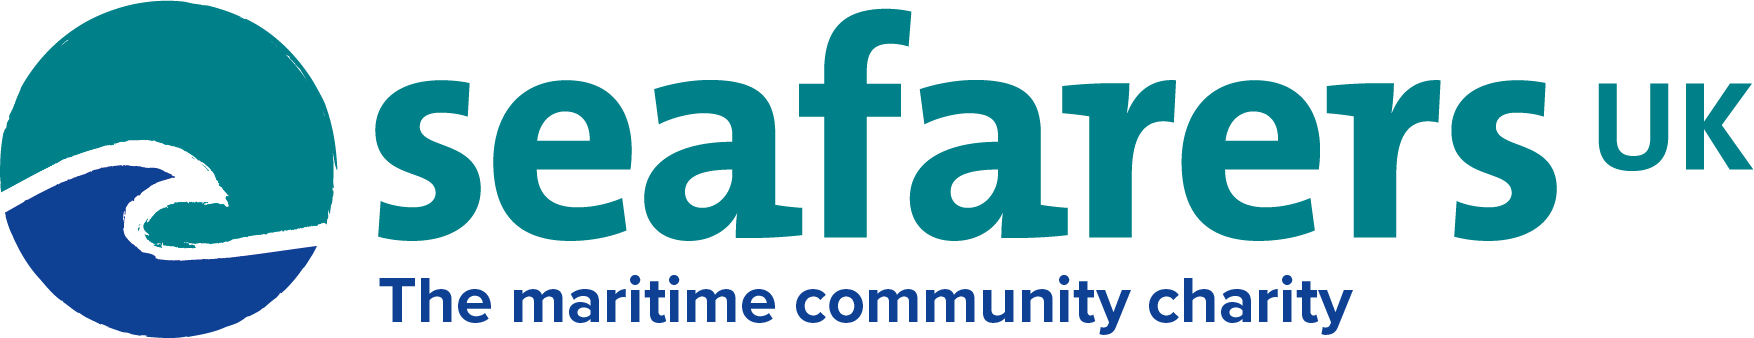 Seafarers logo